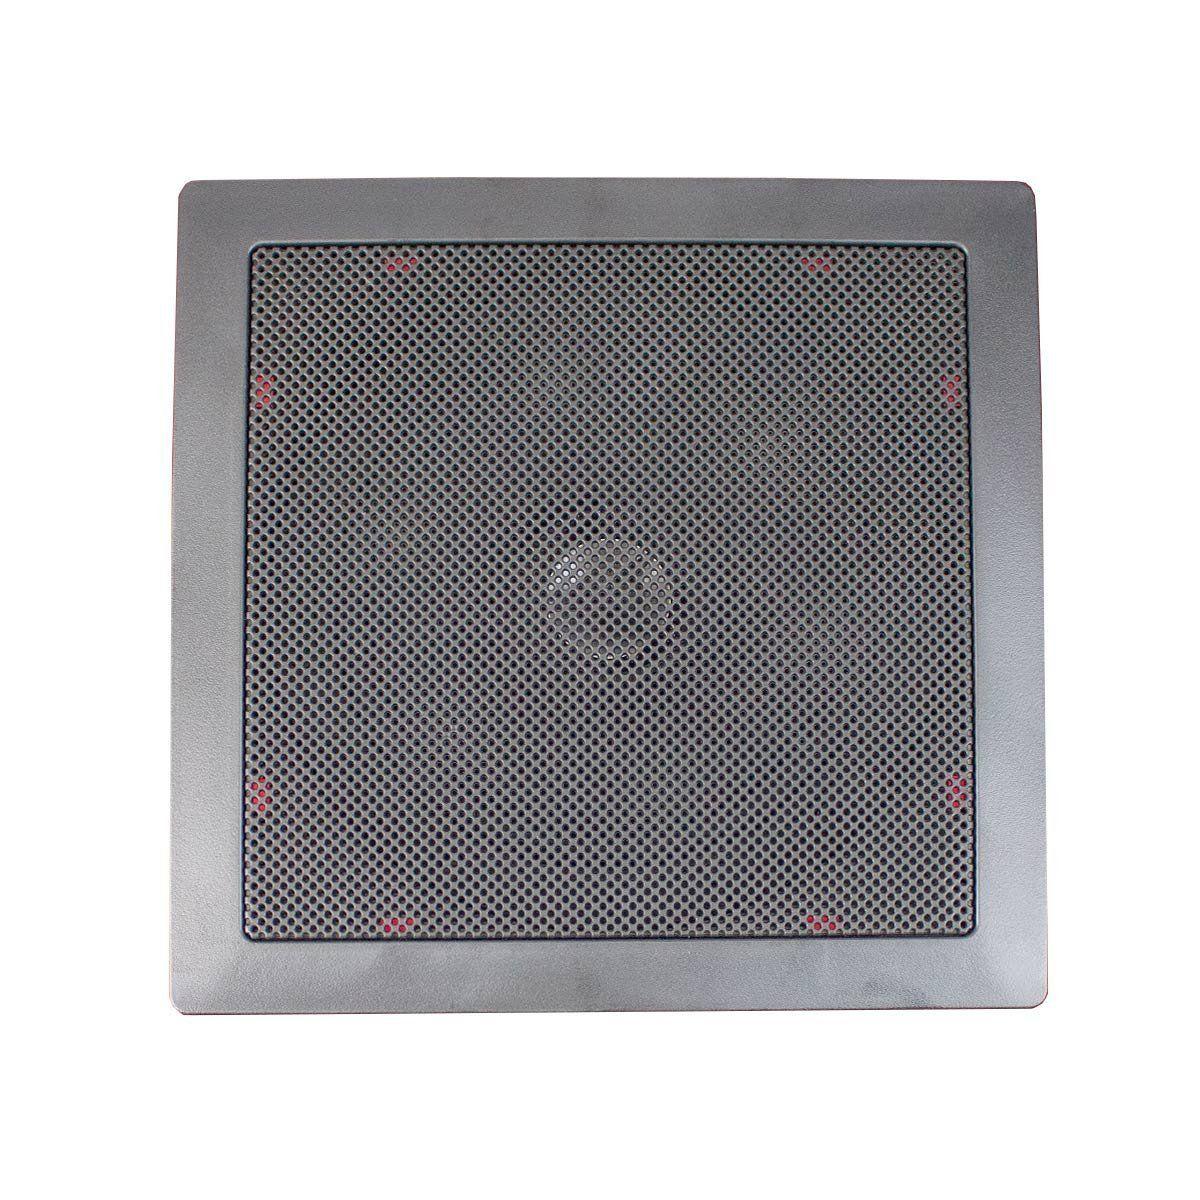 Arandela Quadrada Coaxial 6 Polegadas 50W 2210 - Fiamon